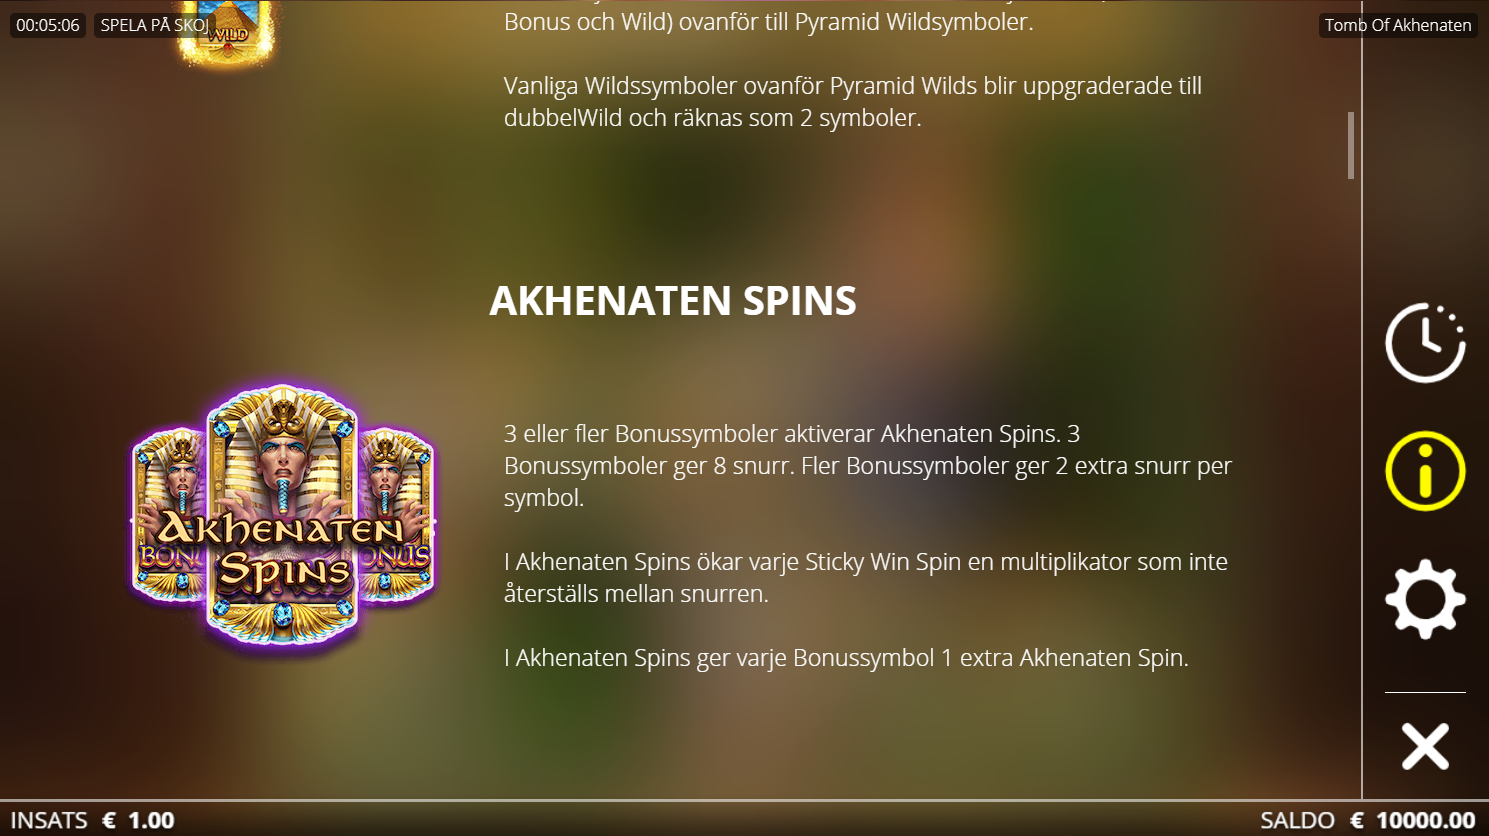 tomb-of-akhenaten-bonus